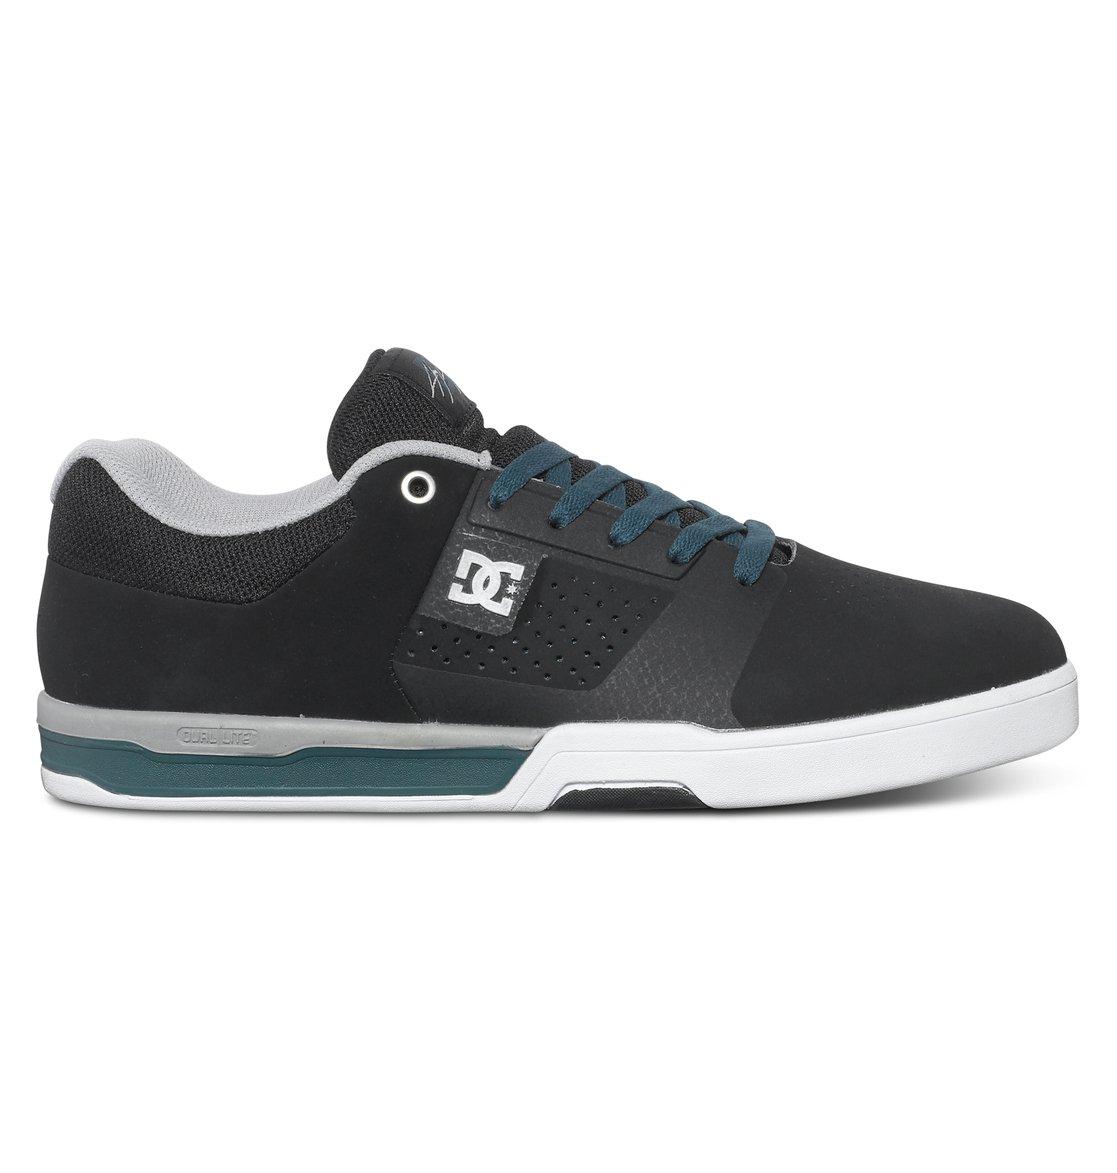 Cole Lite 2 - Dcshoes - Dcshoes������ ���� Cole Lite 2 �� DC Shoes � ������� �� ��������� ����� 2015�. ��������������: ��������� ������ ����� �����, ��������������� ���, ������ � ���������� �� ���� ������������� ���������� UniLite�.<br>